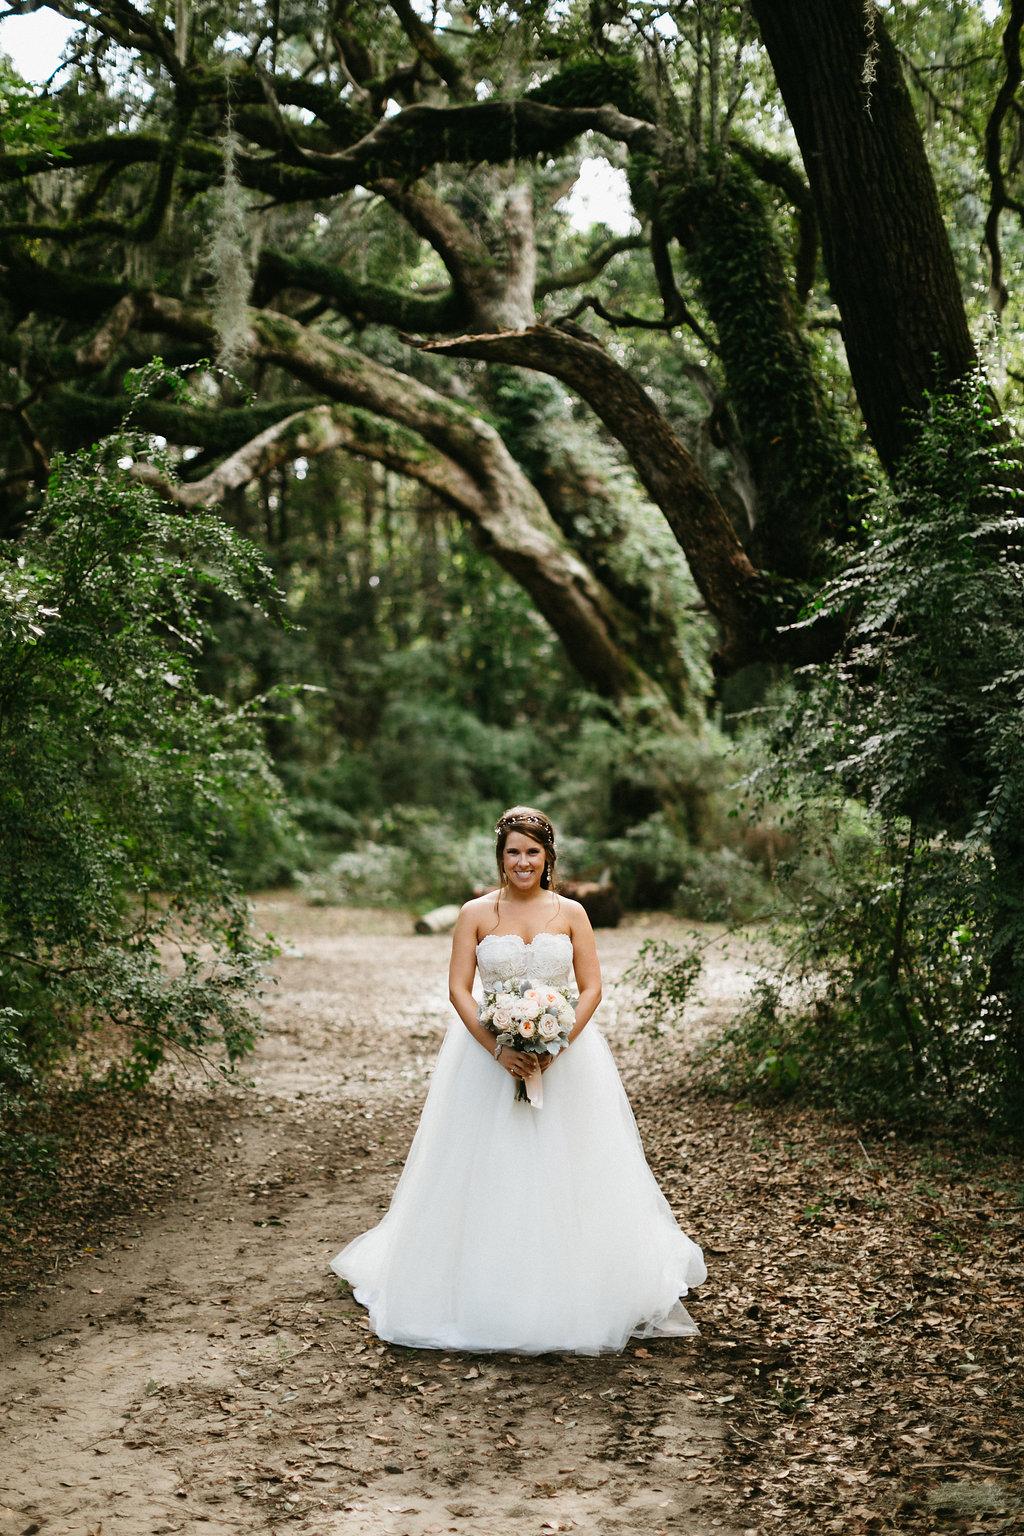 Charleston wedding at Wingate Plantation on Johns Island, SC l Katherine & Rob l Monika Gauthier Photography